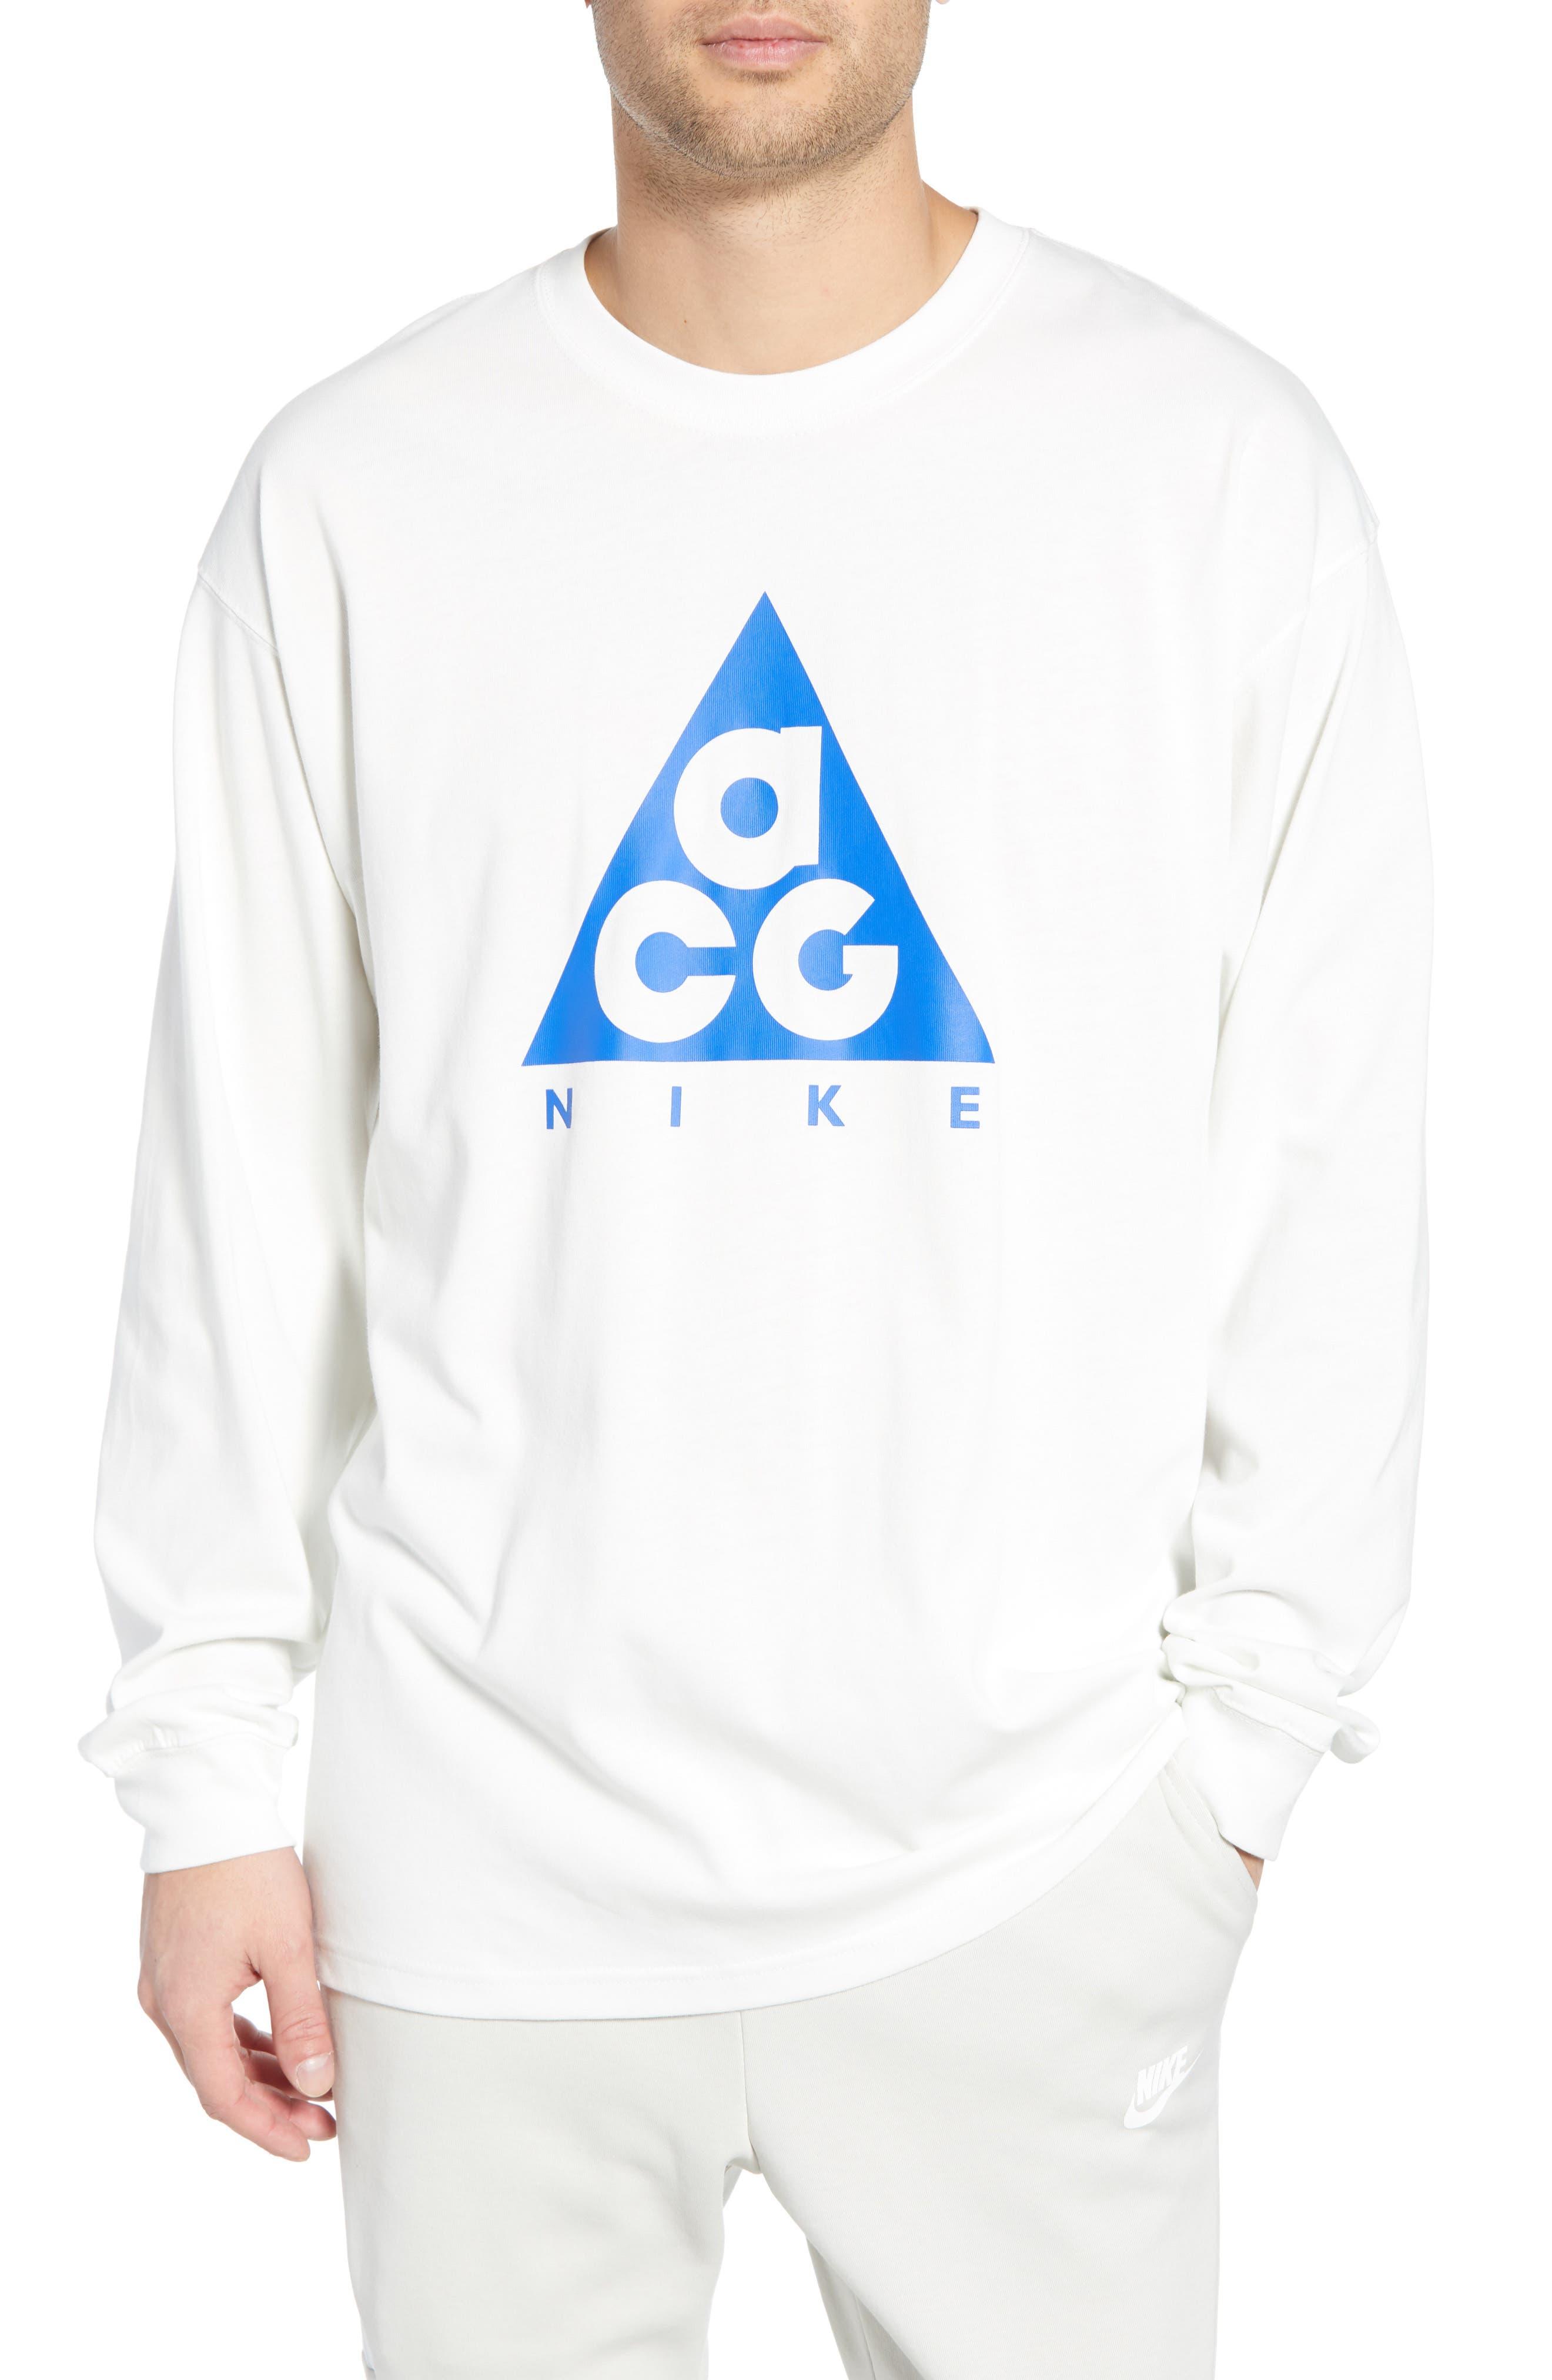 Nike Nrg All Conditions Gear Logo T-Shirt, White